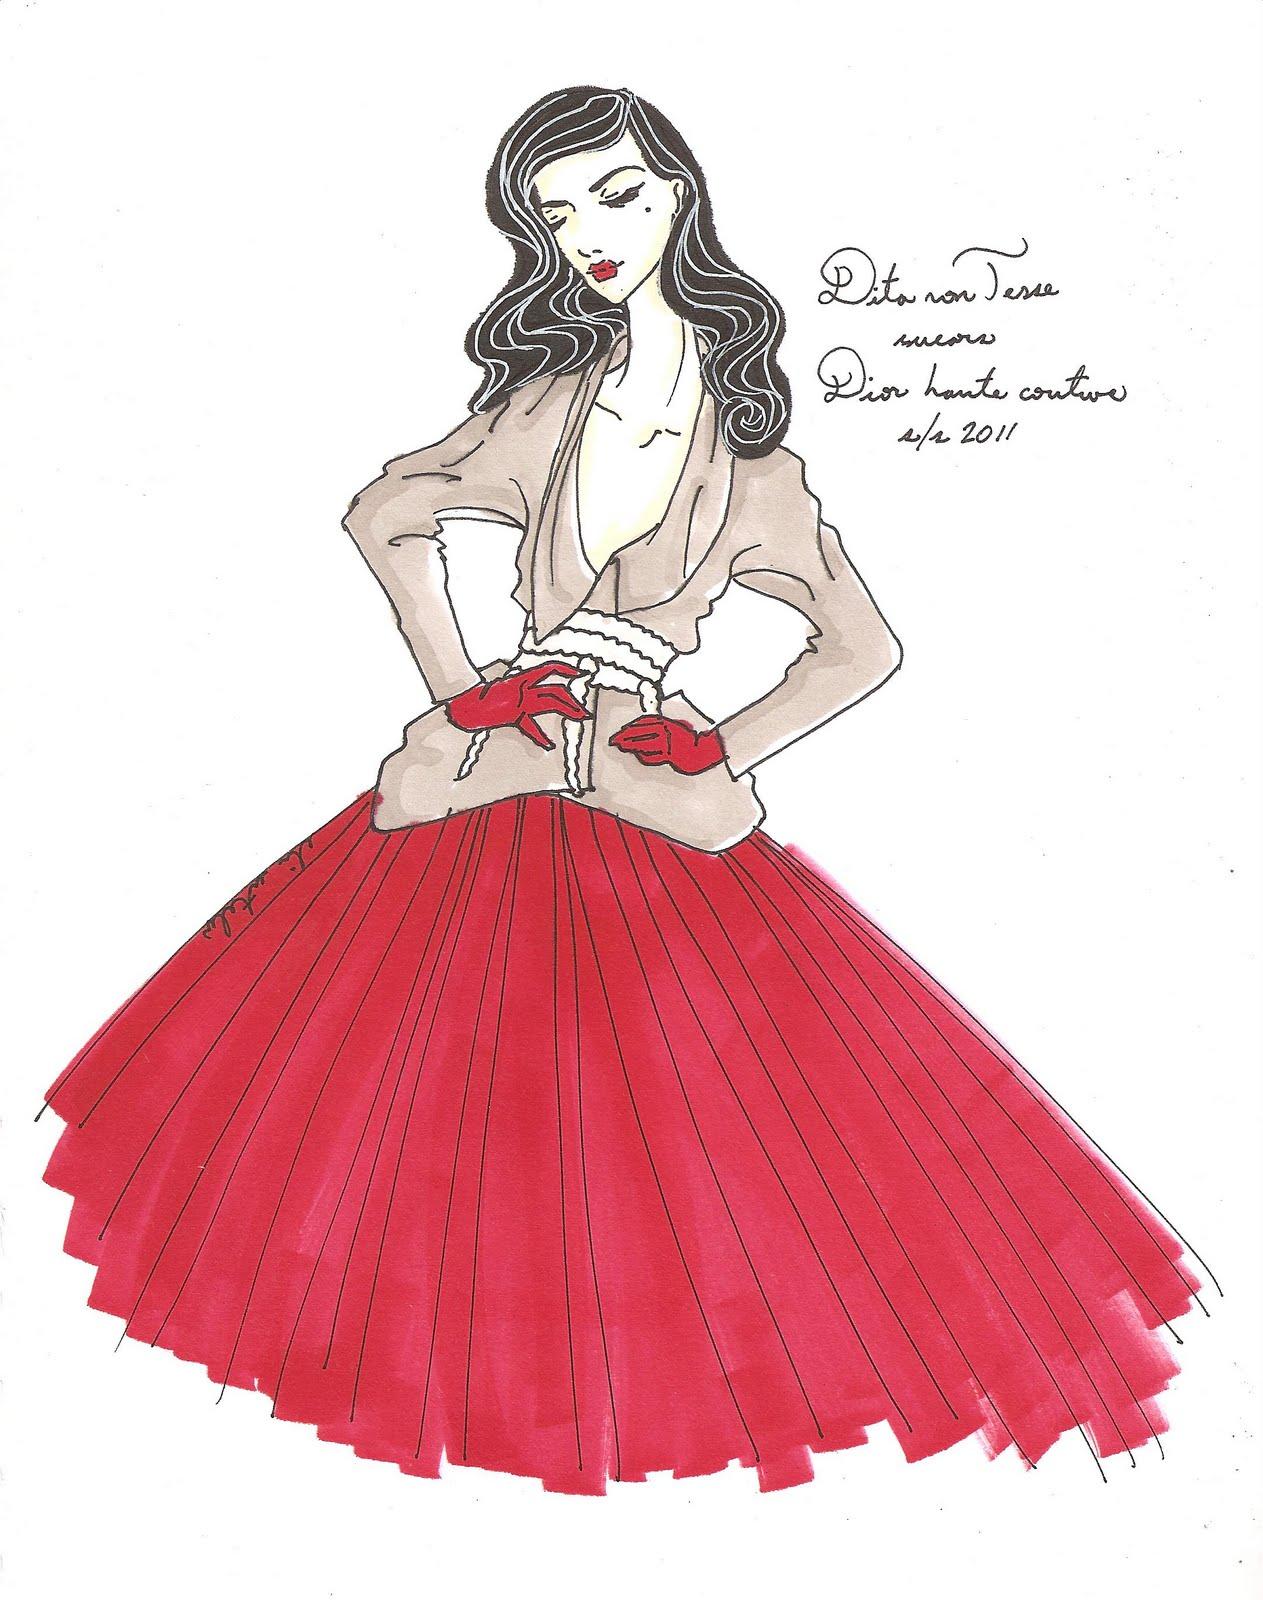 http://4.bp.blogspot.com/--GQ-0qeQf-M/TdCT3Ww3obI/AAAAAAAAEbY/HxsMa43naLw/s1600/Dita+Dior.jpg